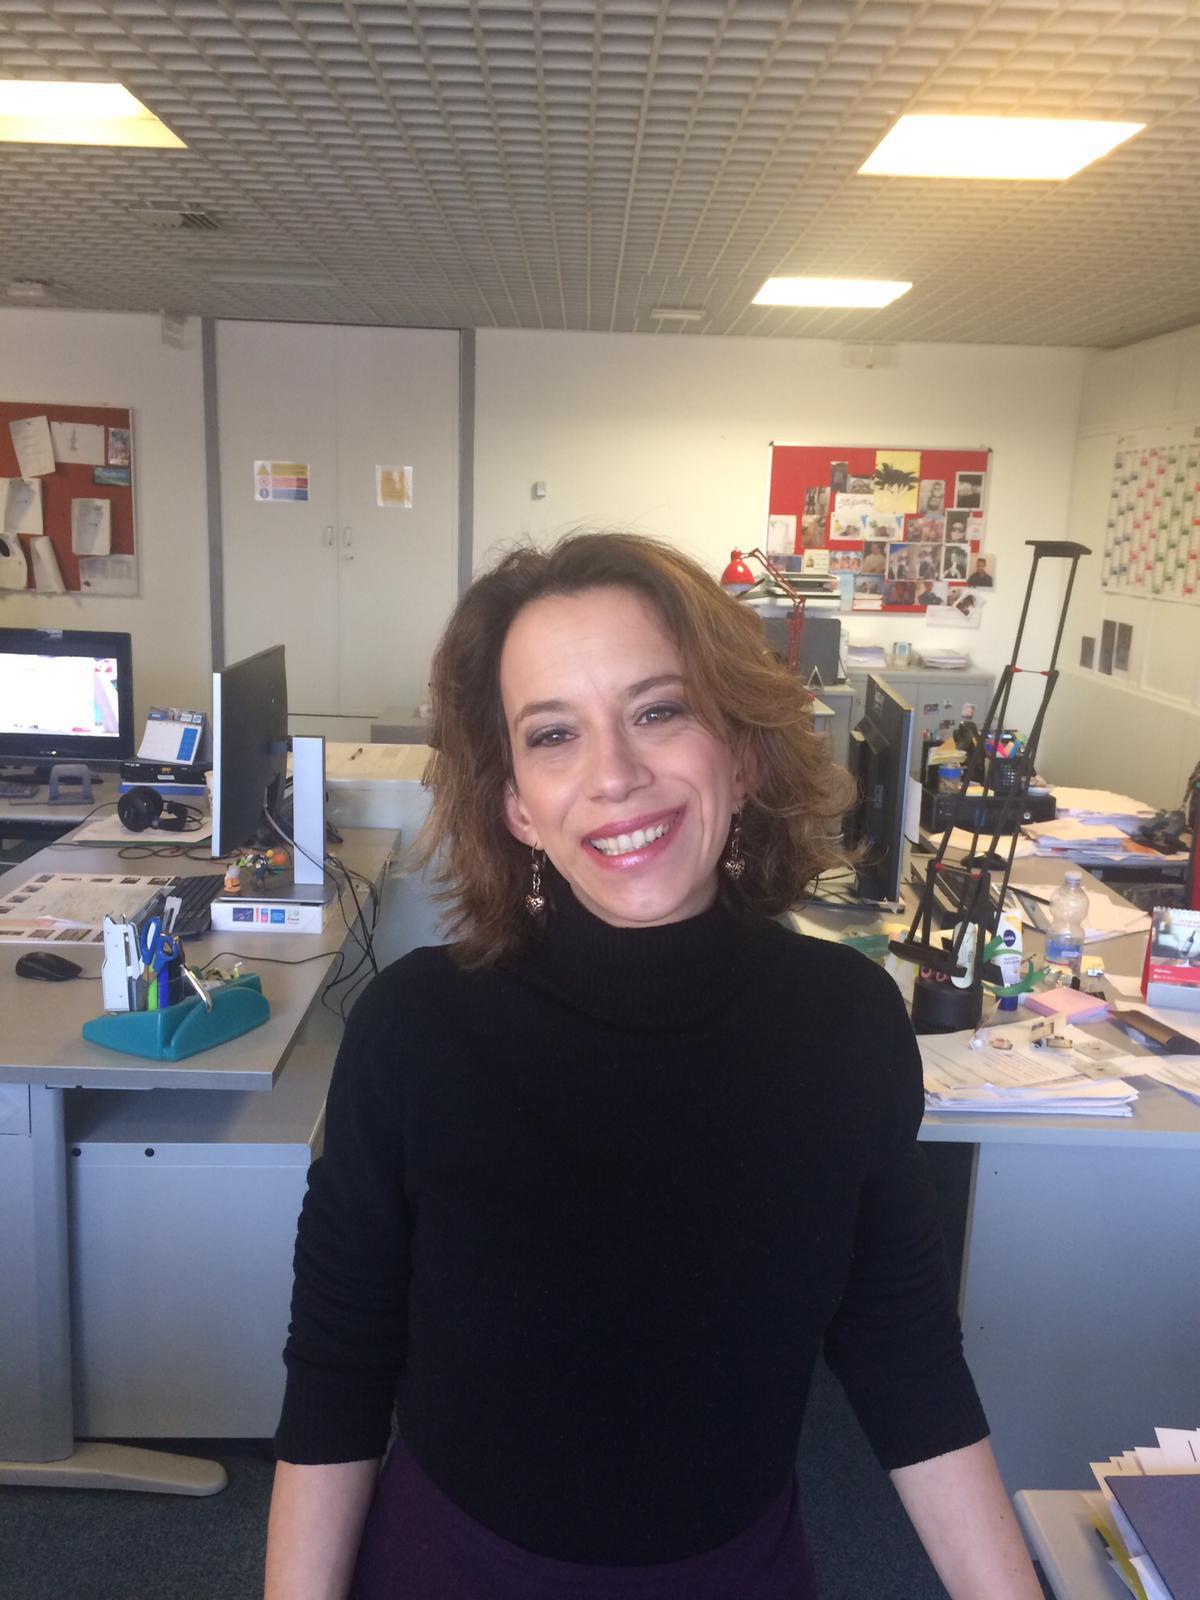 Chiara Foschi